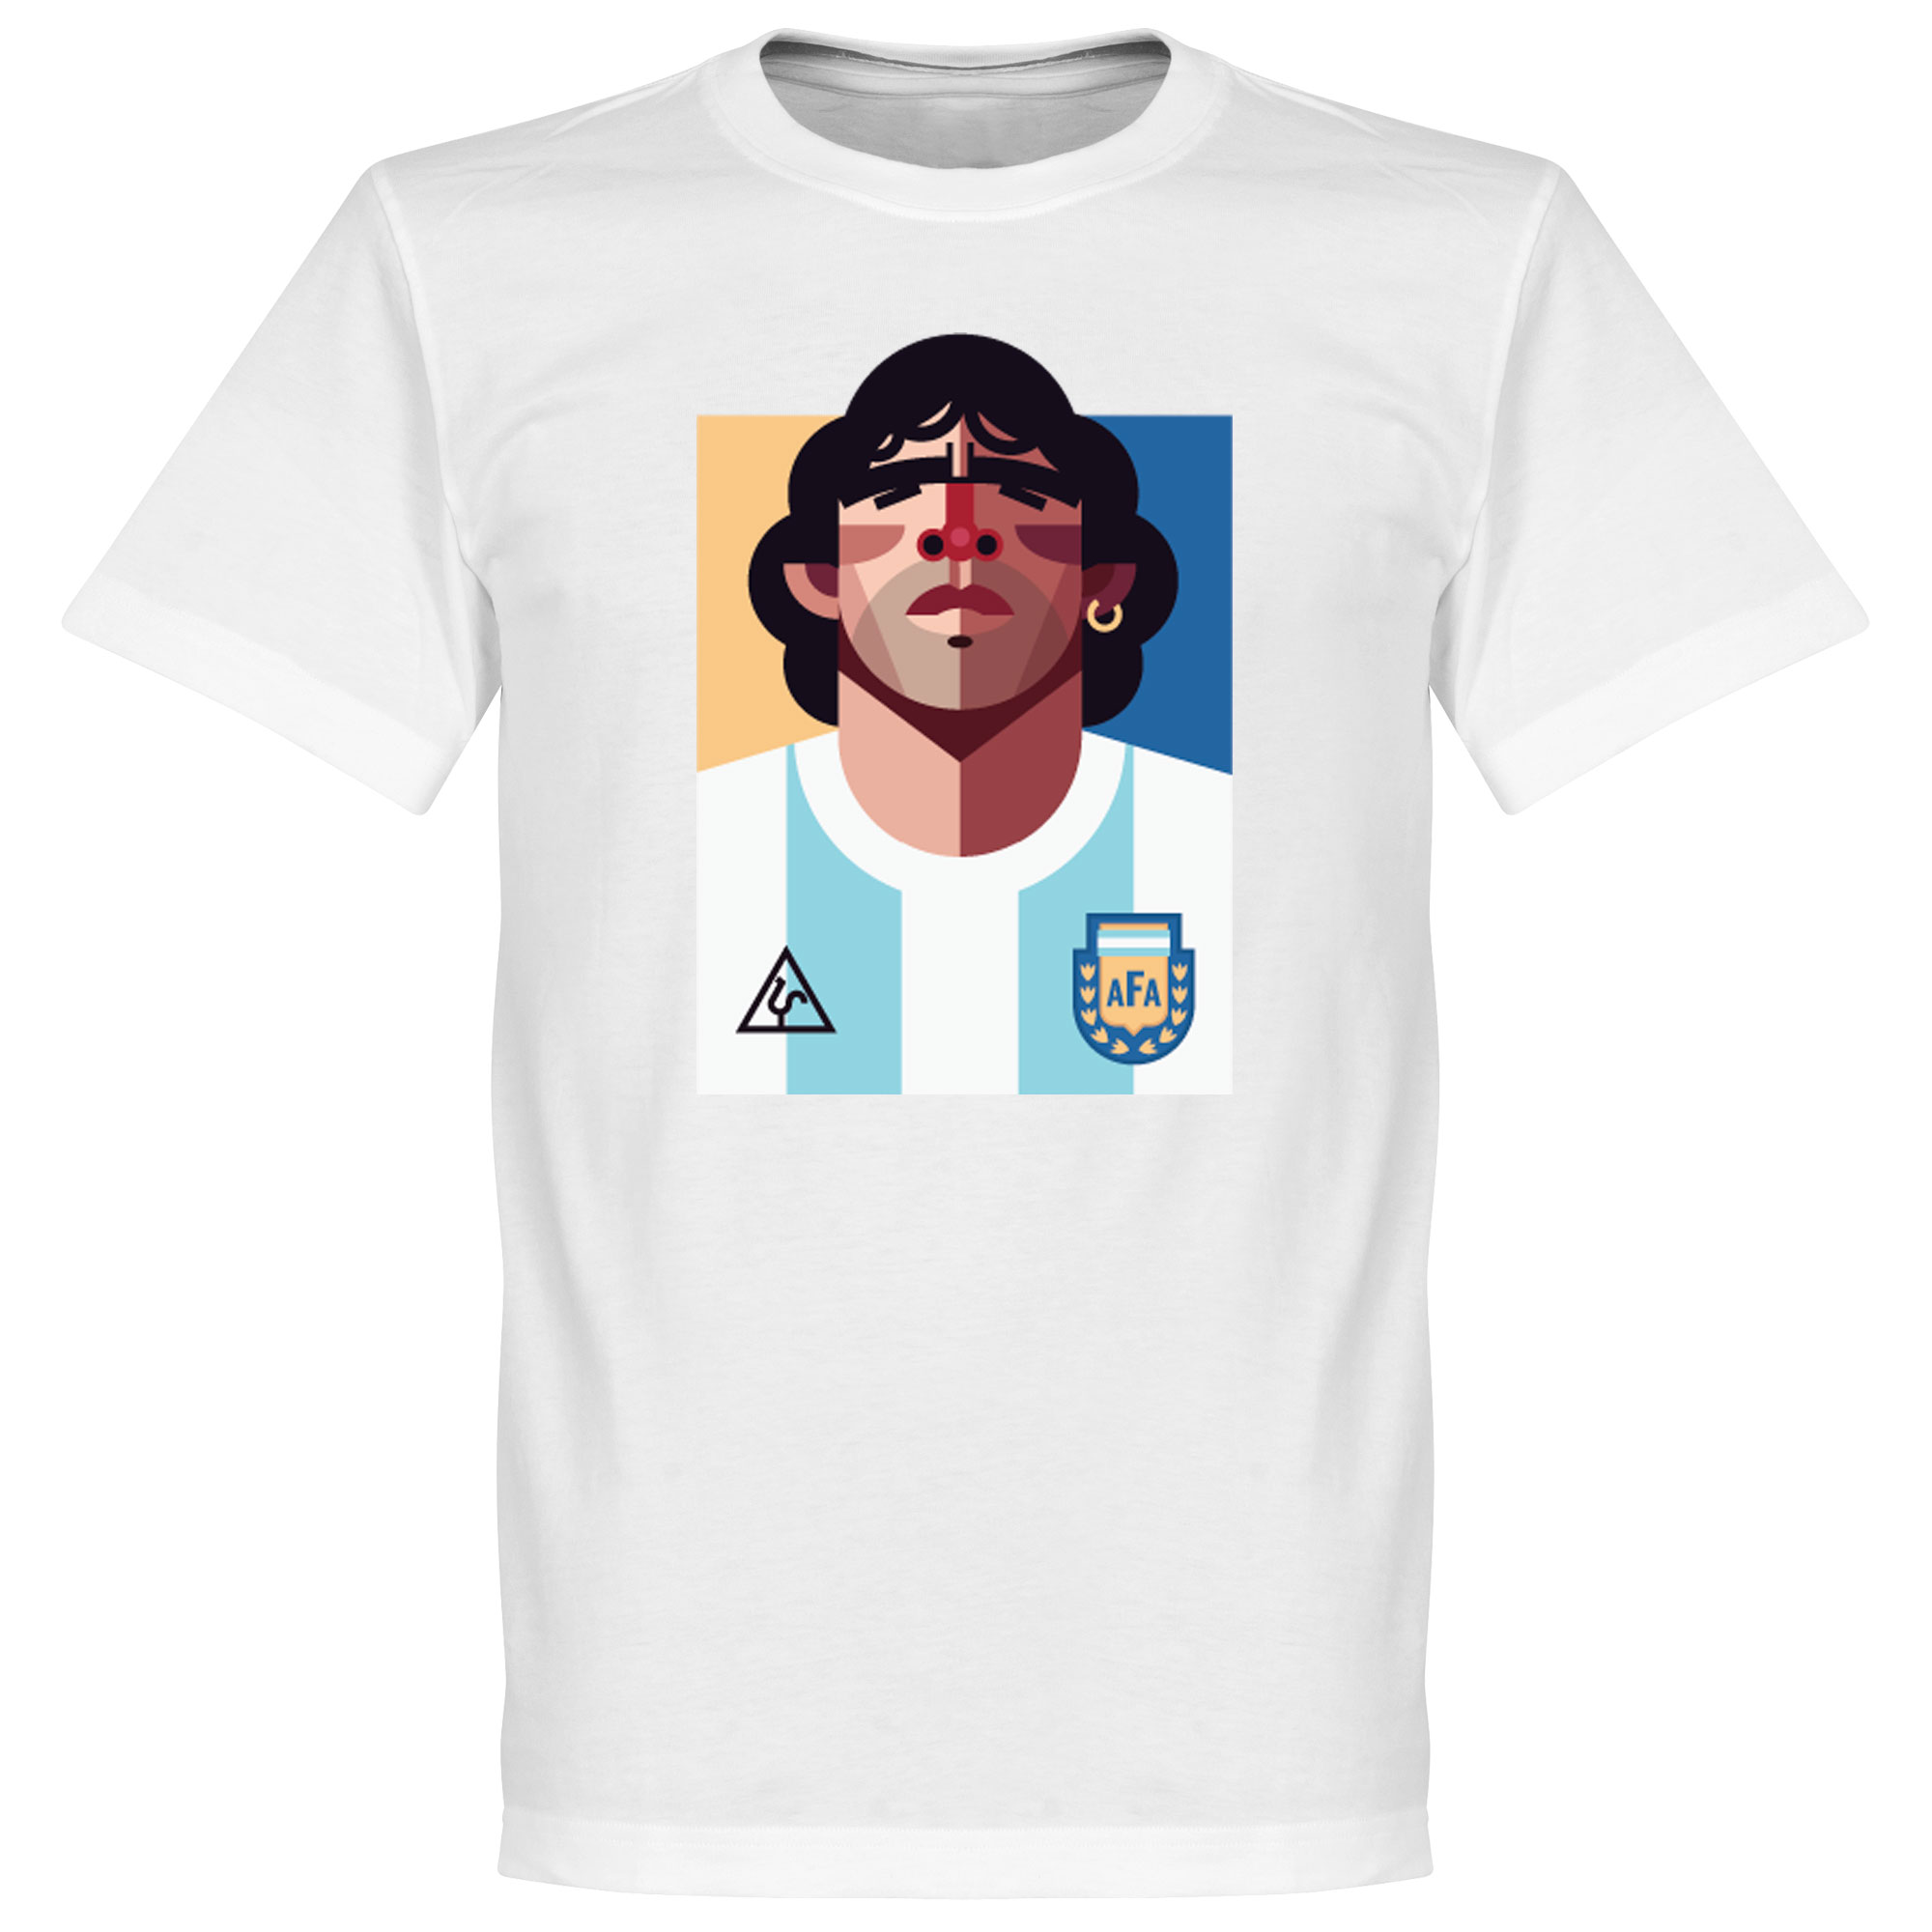 Playmaker Maradona Tee - L